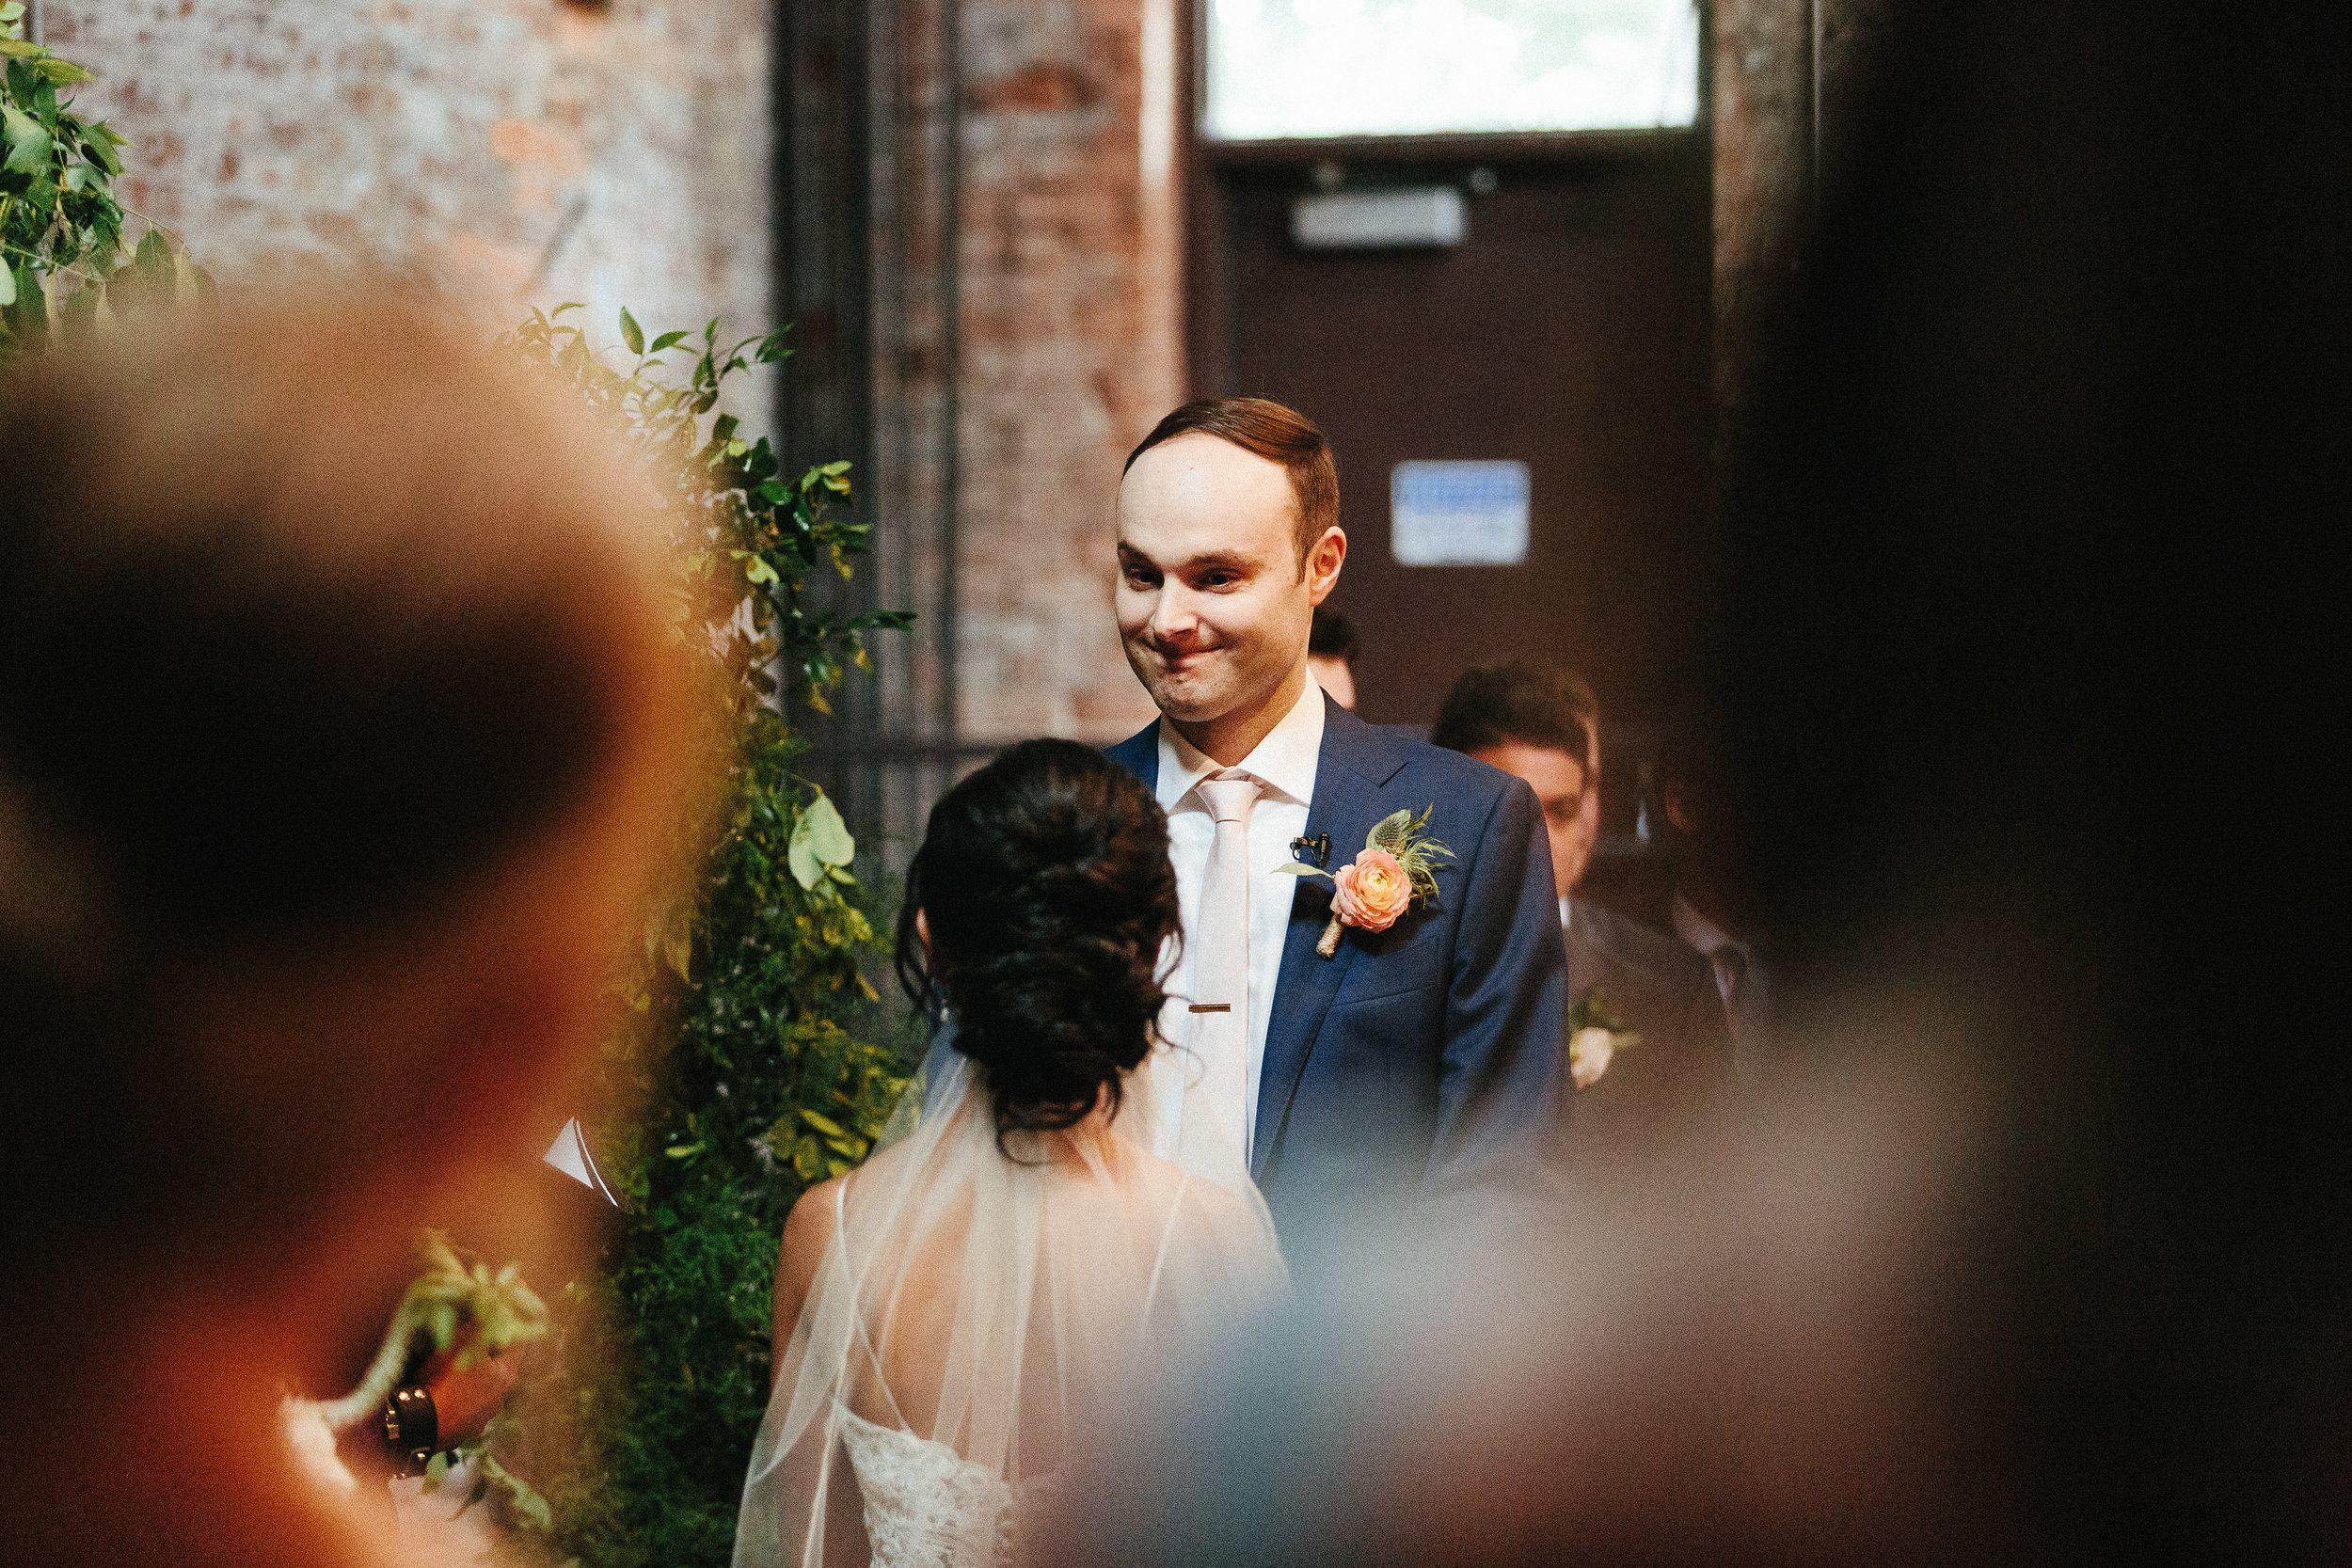 king_plow_atlanta_wedding_art_gallery_modern_lifestyle_documentary_1479.jpg